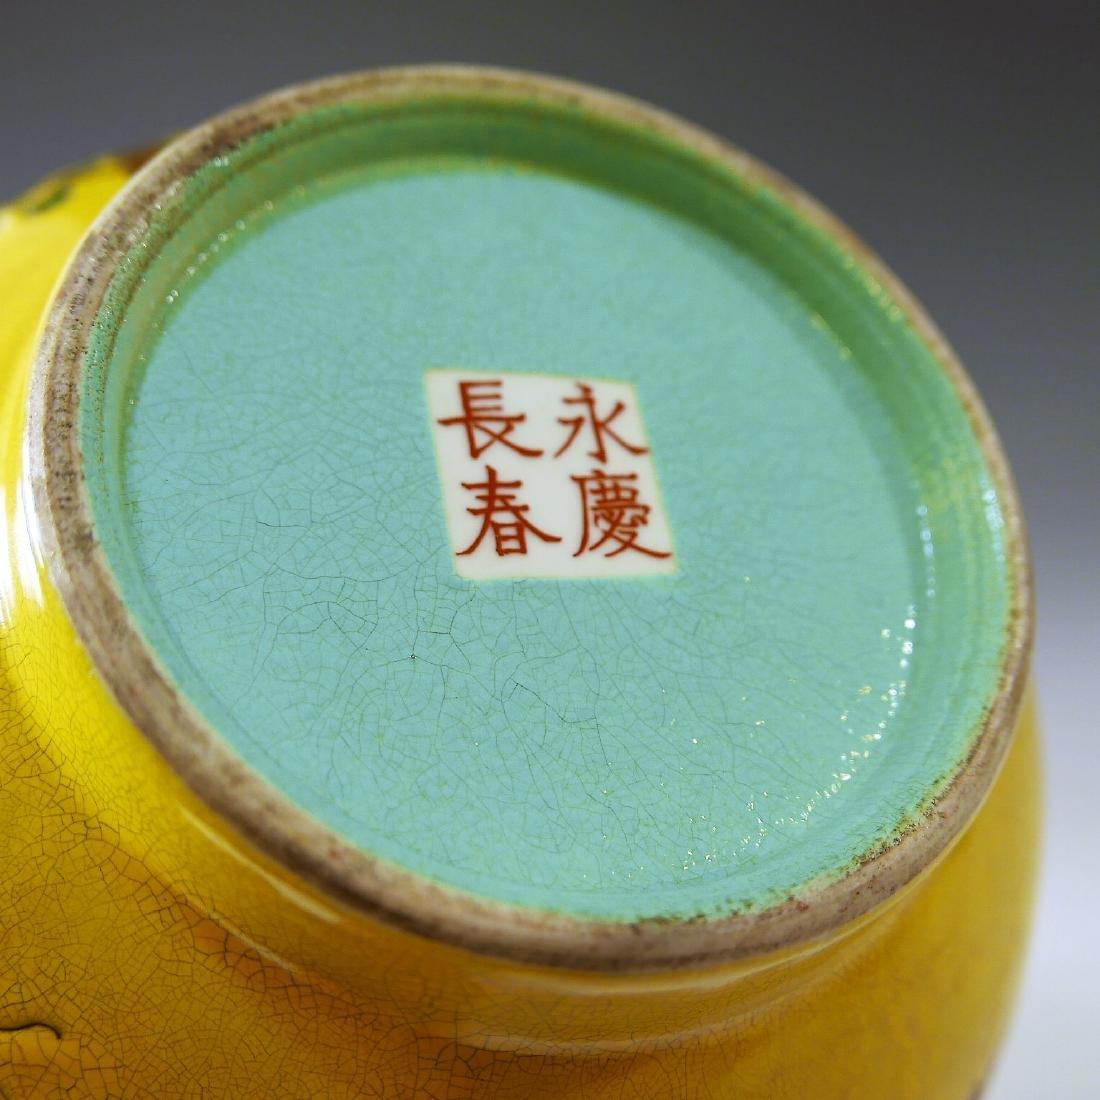 CHINESE ANTIQUE FAMILLE ROSE PORCELAIN VASE - DAYAZHAI - 8